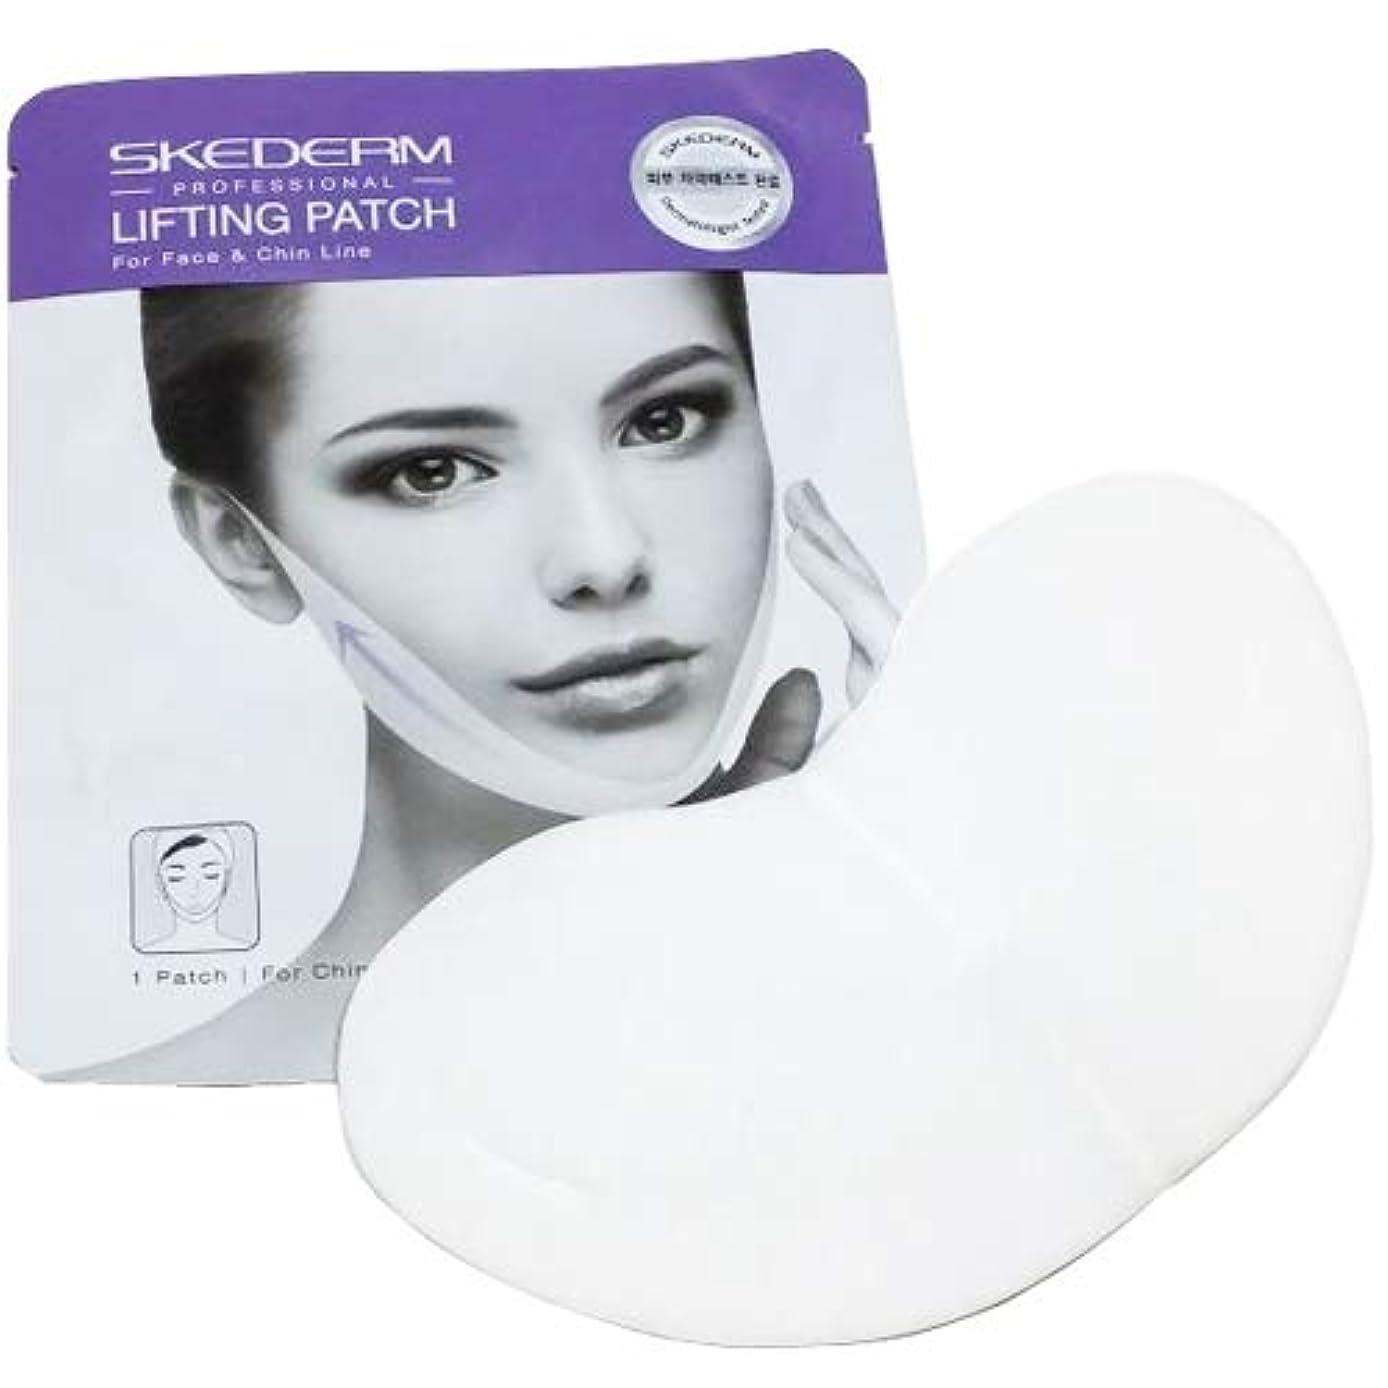 SCEDERM リフティング パッチ 7g×9枚 韓国化粧品 V-TOXリフティングマスク マスク リフティング パッチ 小顔、顎ラインの必須アイテム Vライン